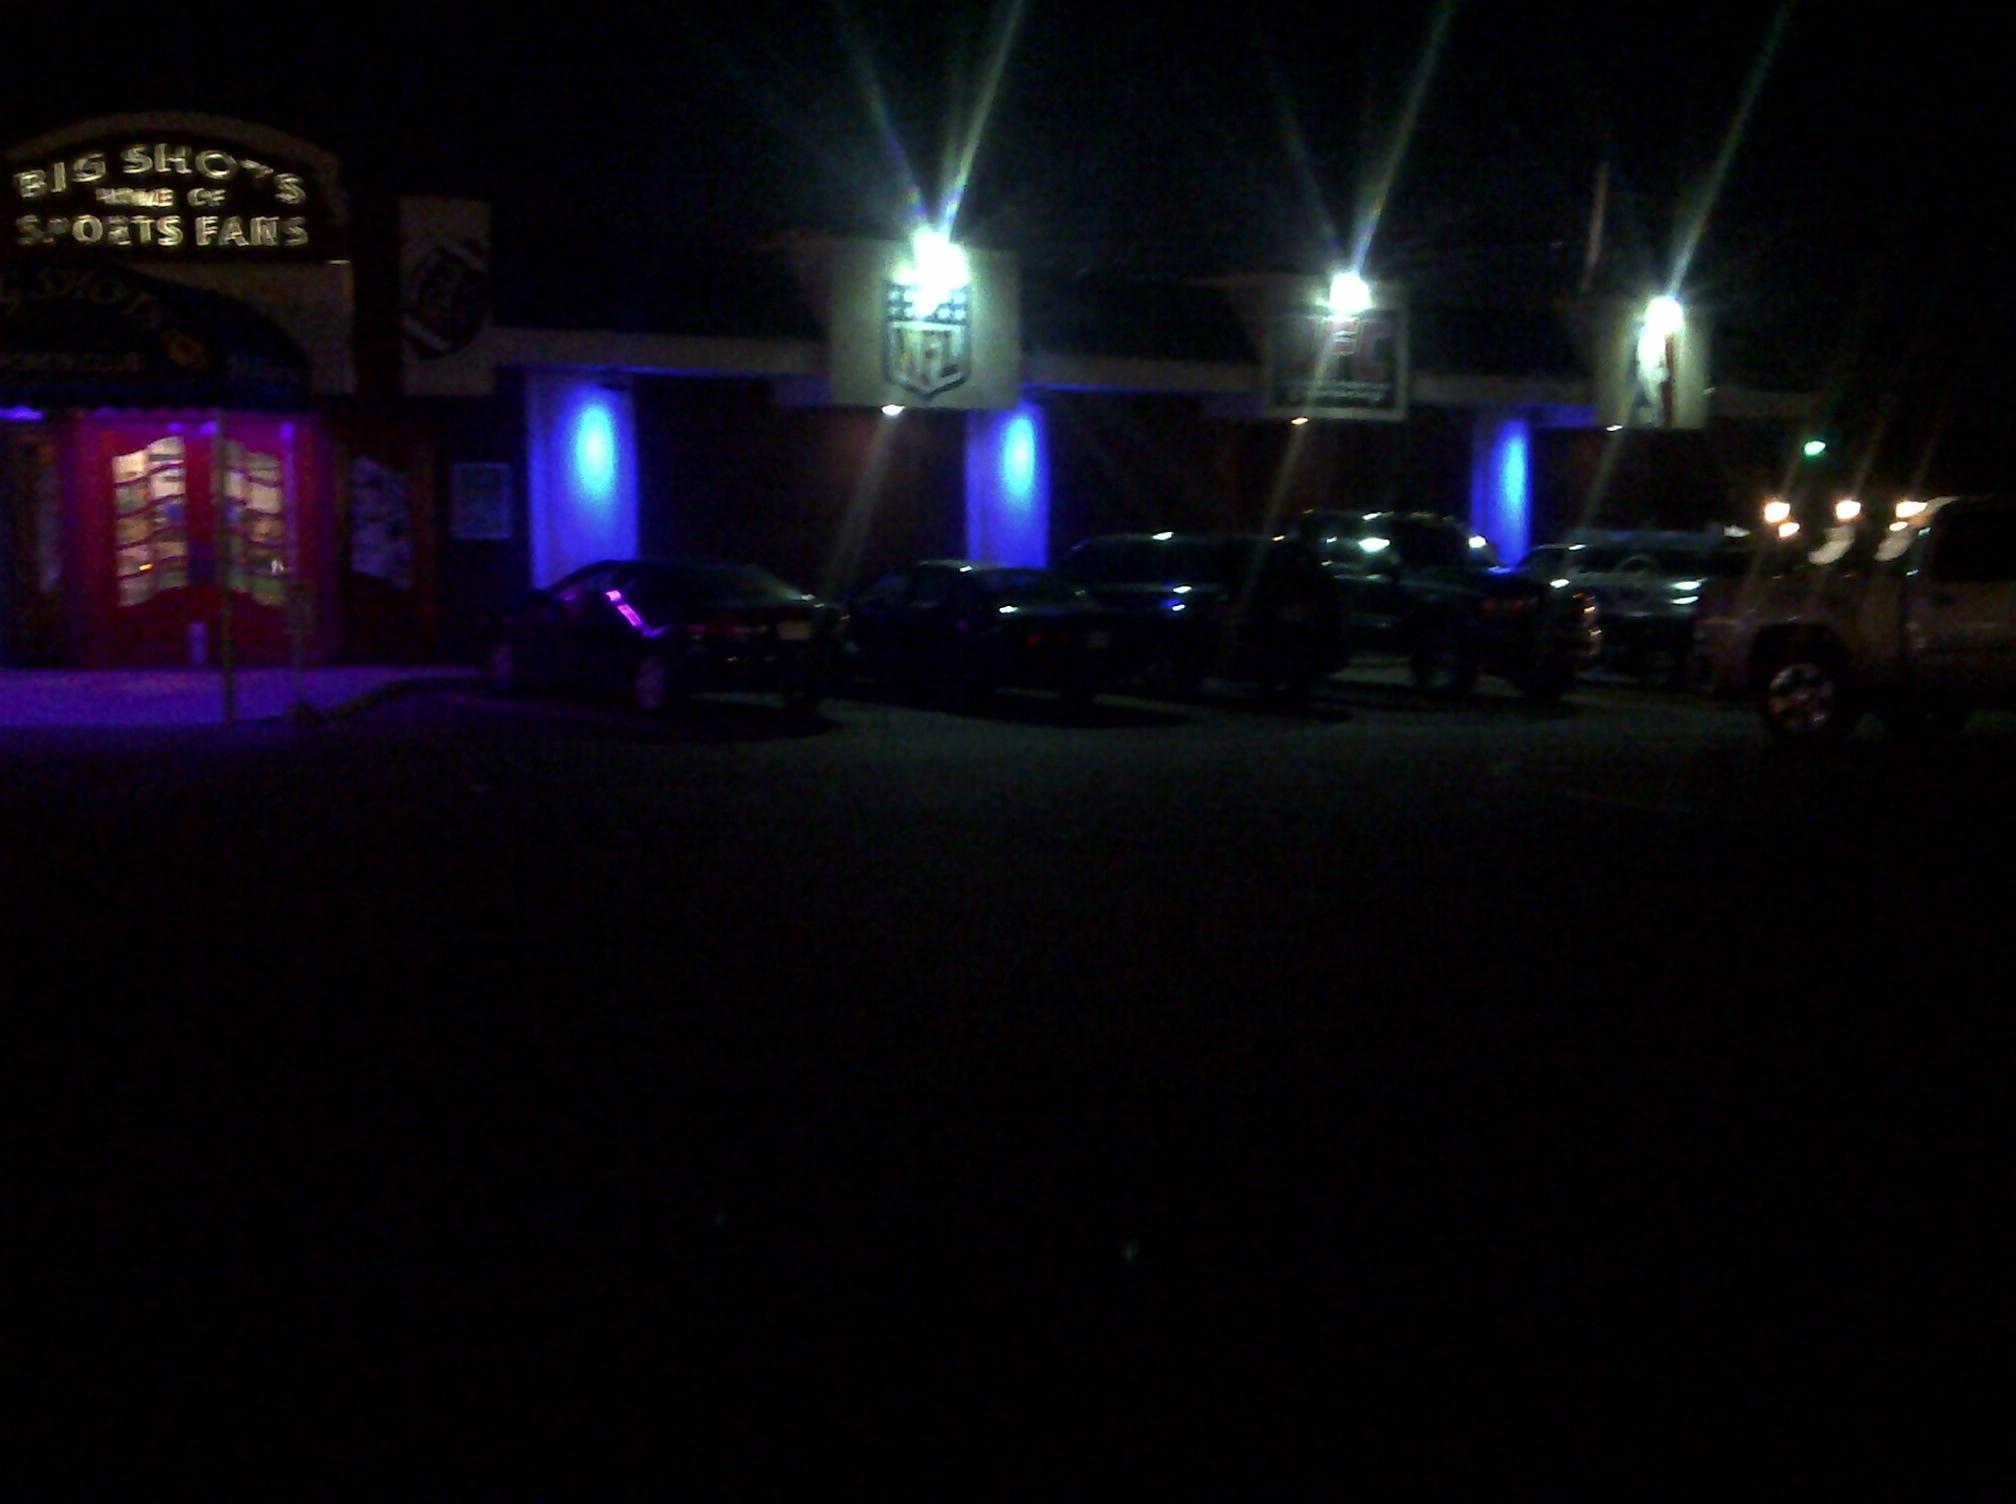 Big shots outdoor led lighting 11.jpg